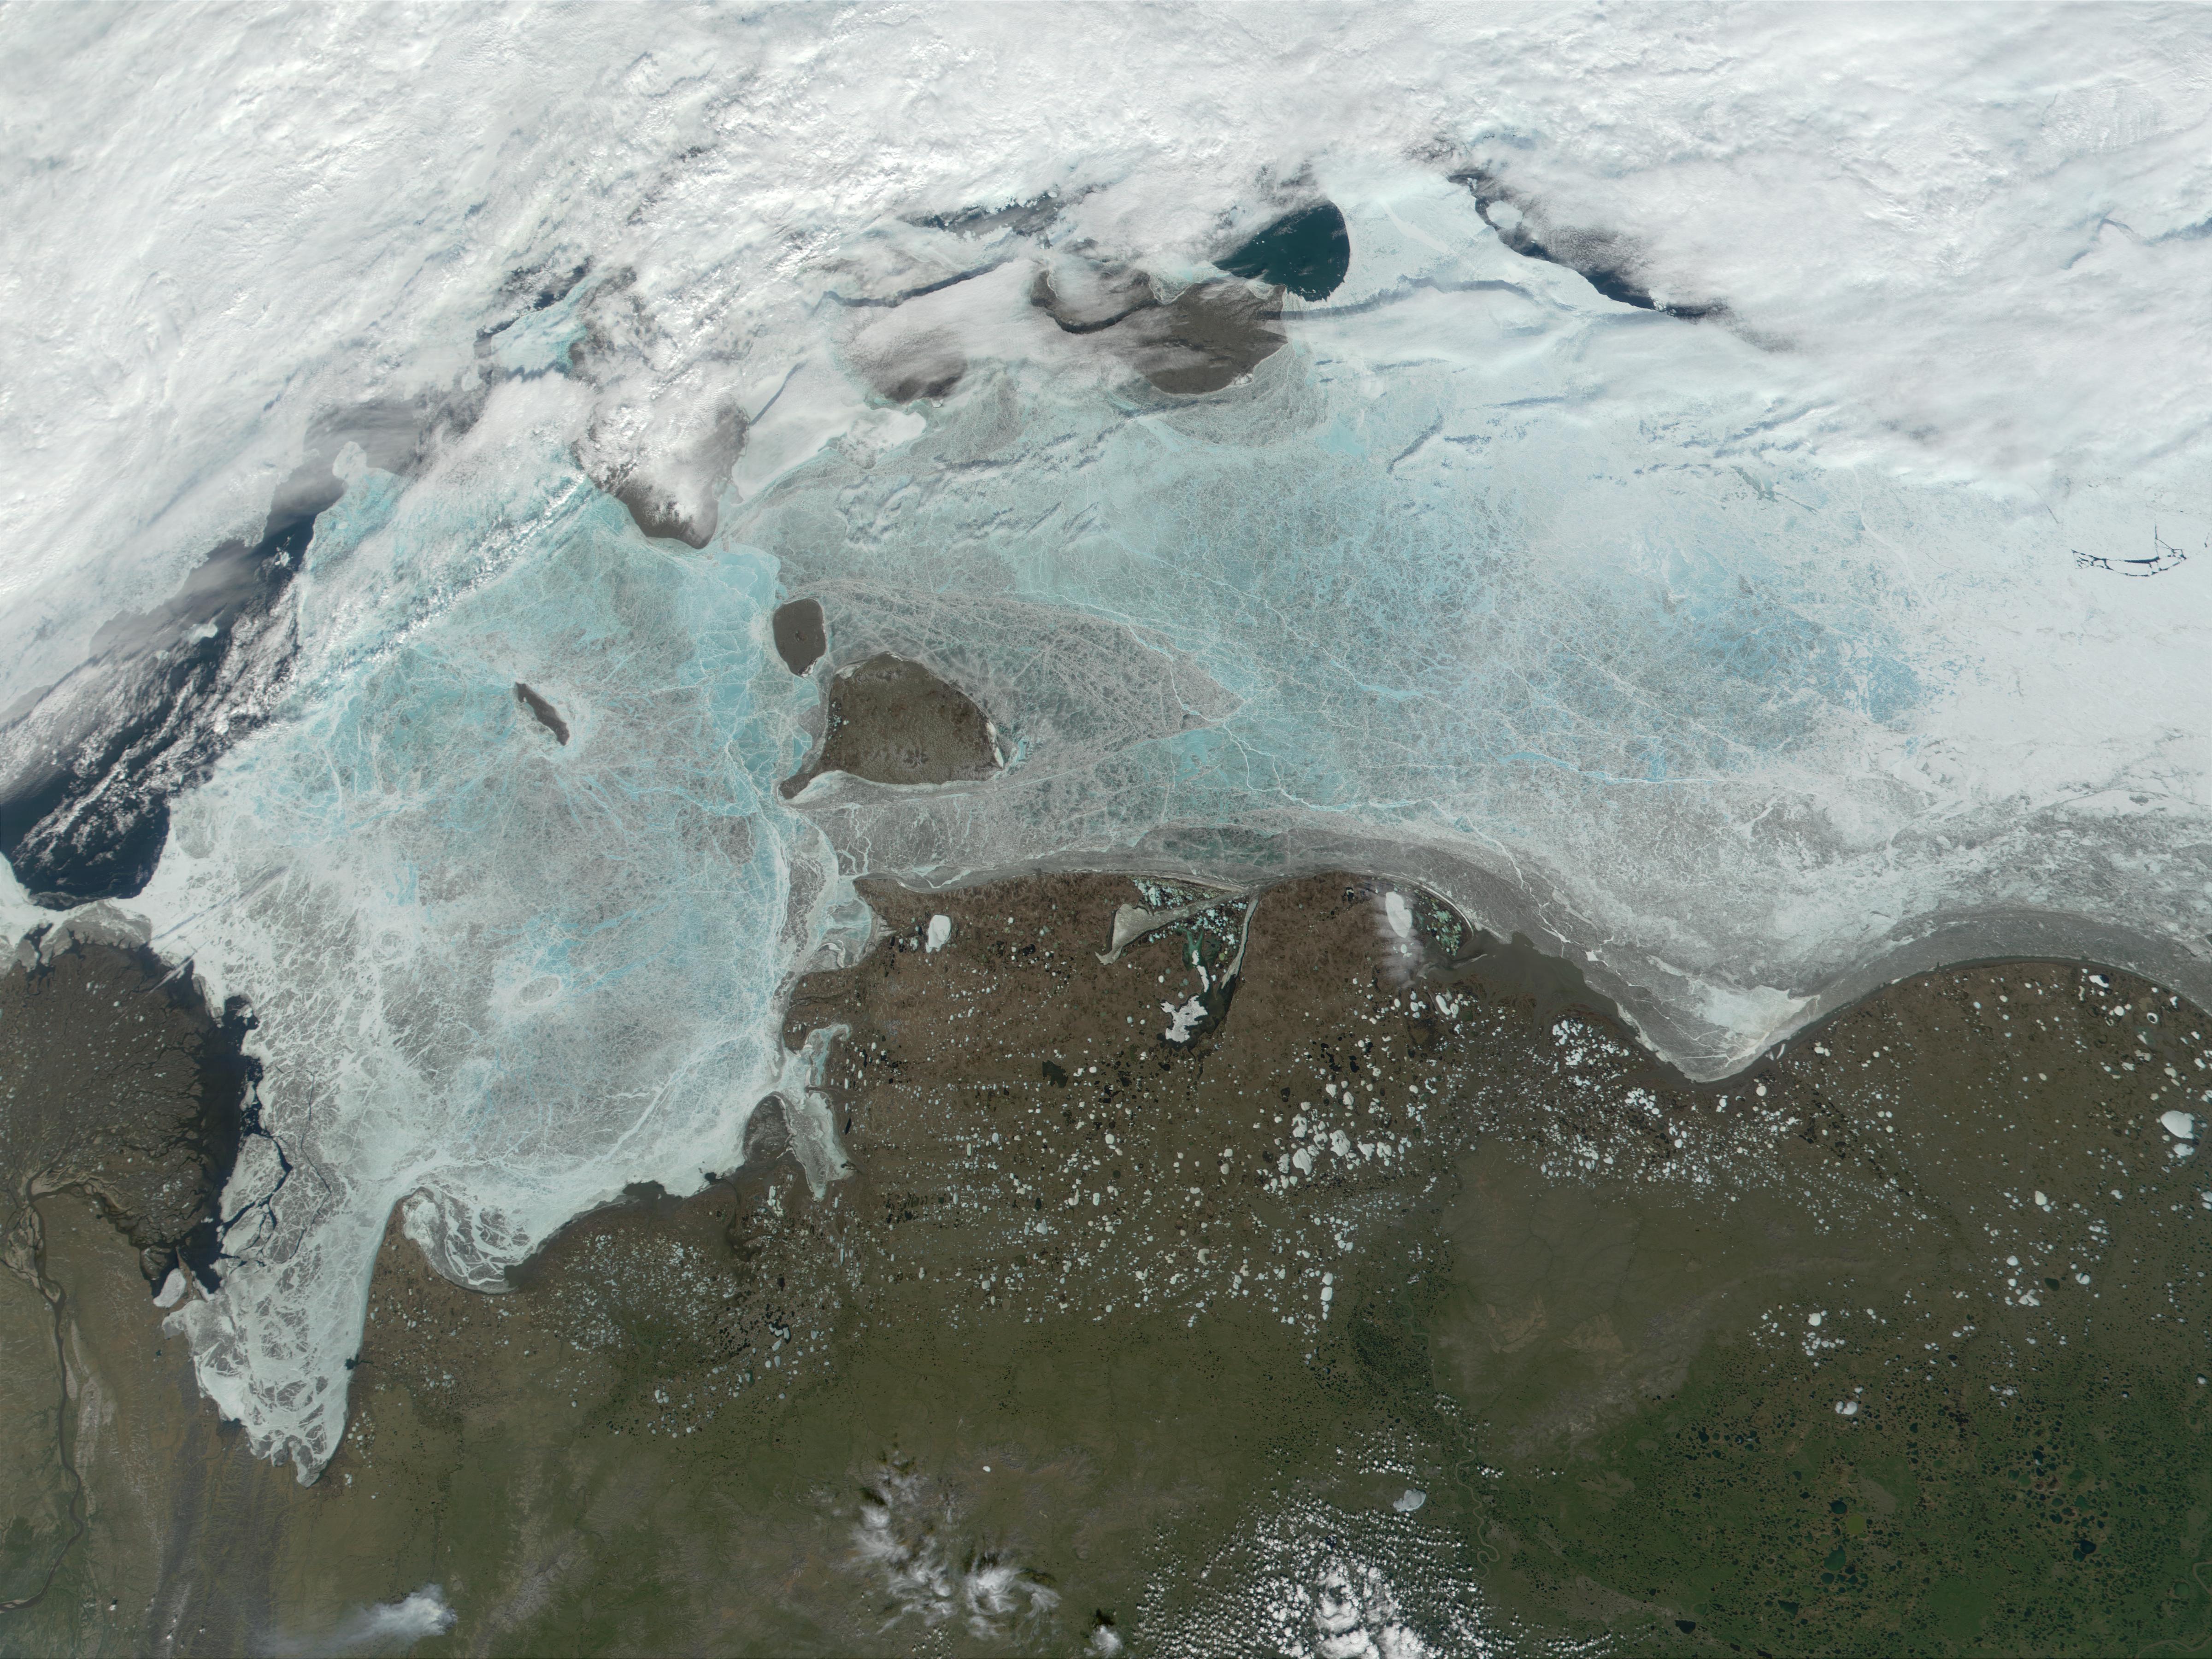 NASA Visible Earth: Coast of East Siberian Sea and Laptev Sea.